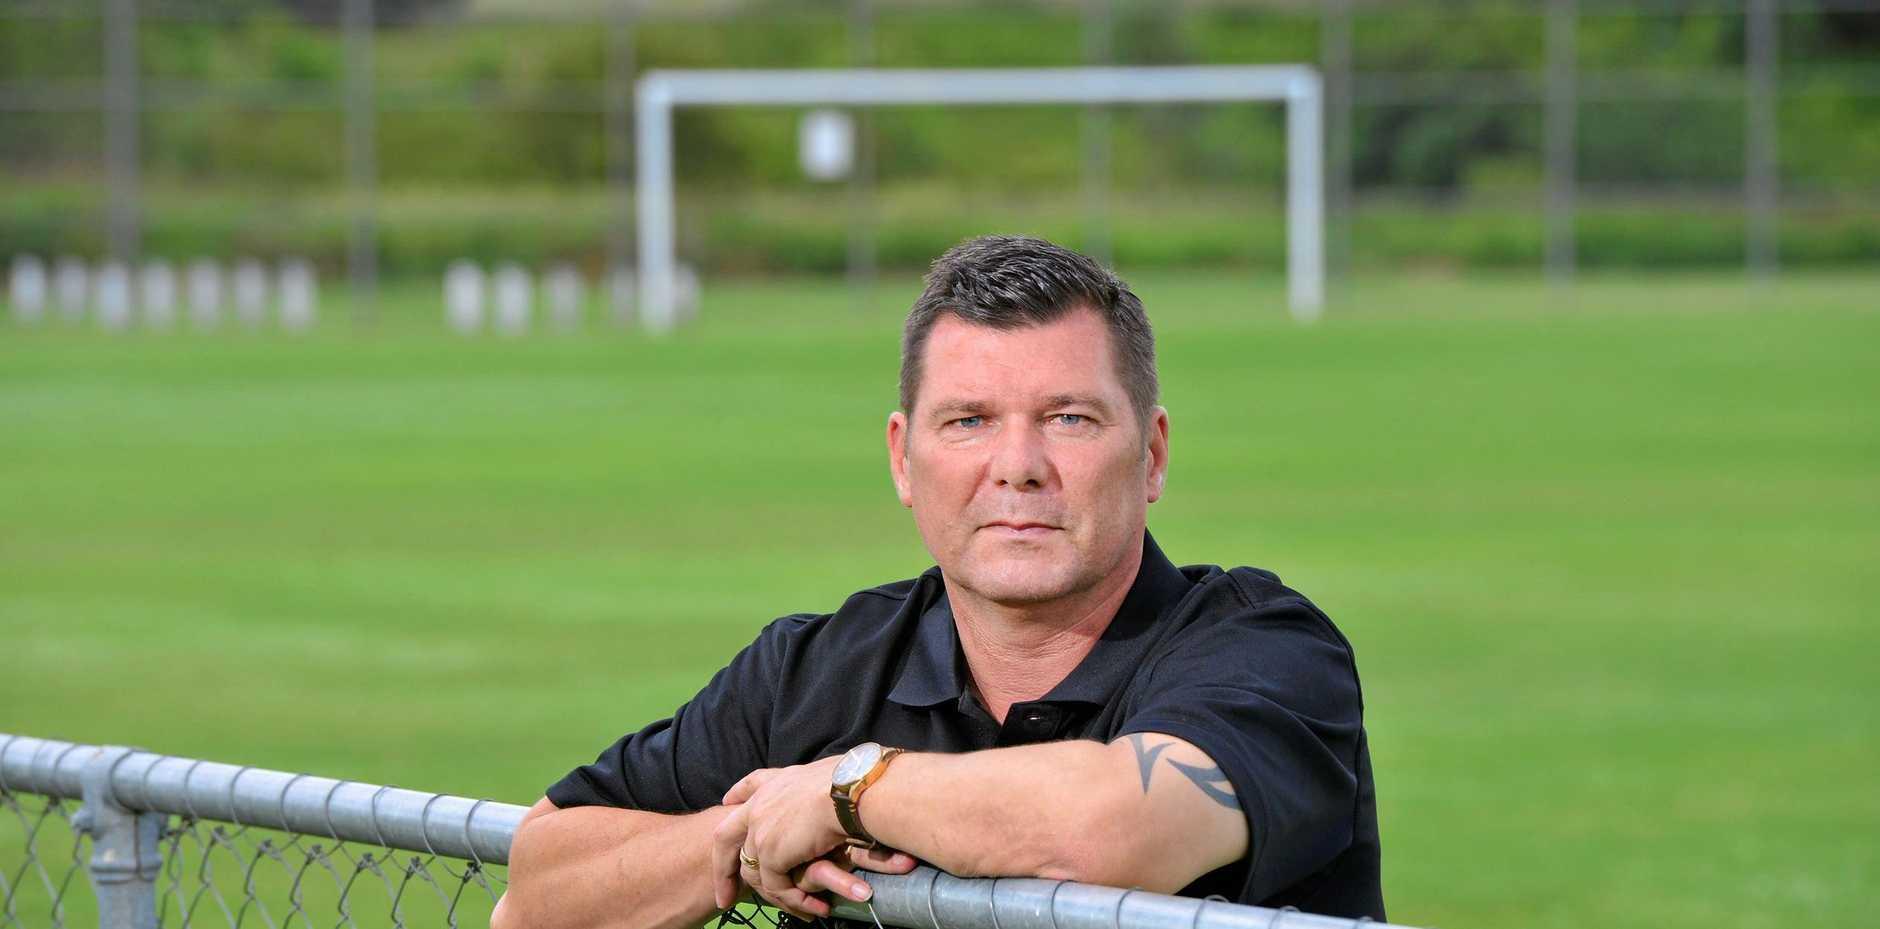 Ipswich Knights new head coach Danny Mchenery.